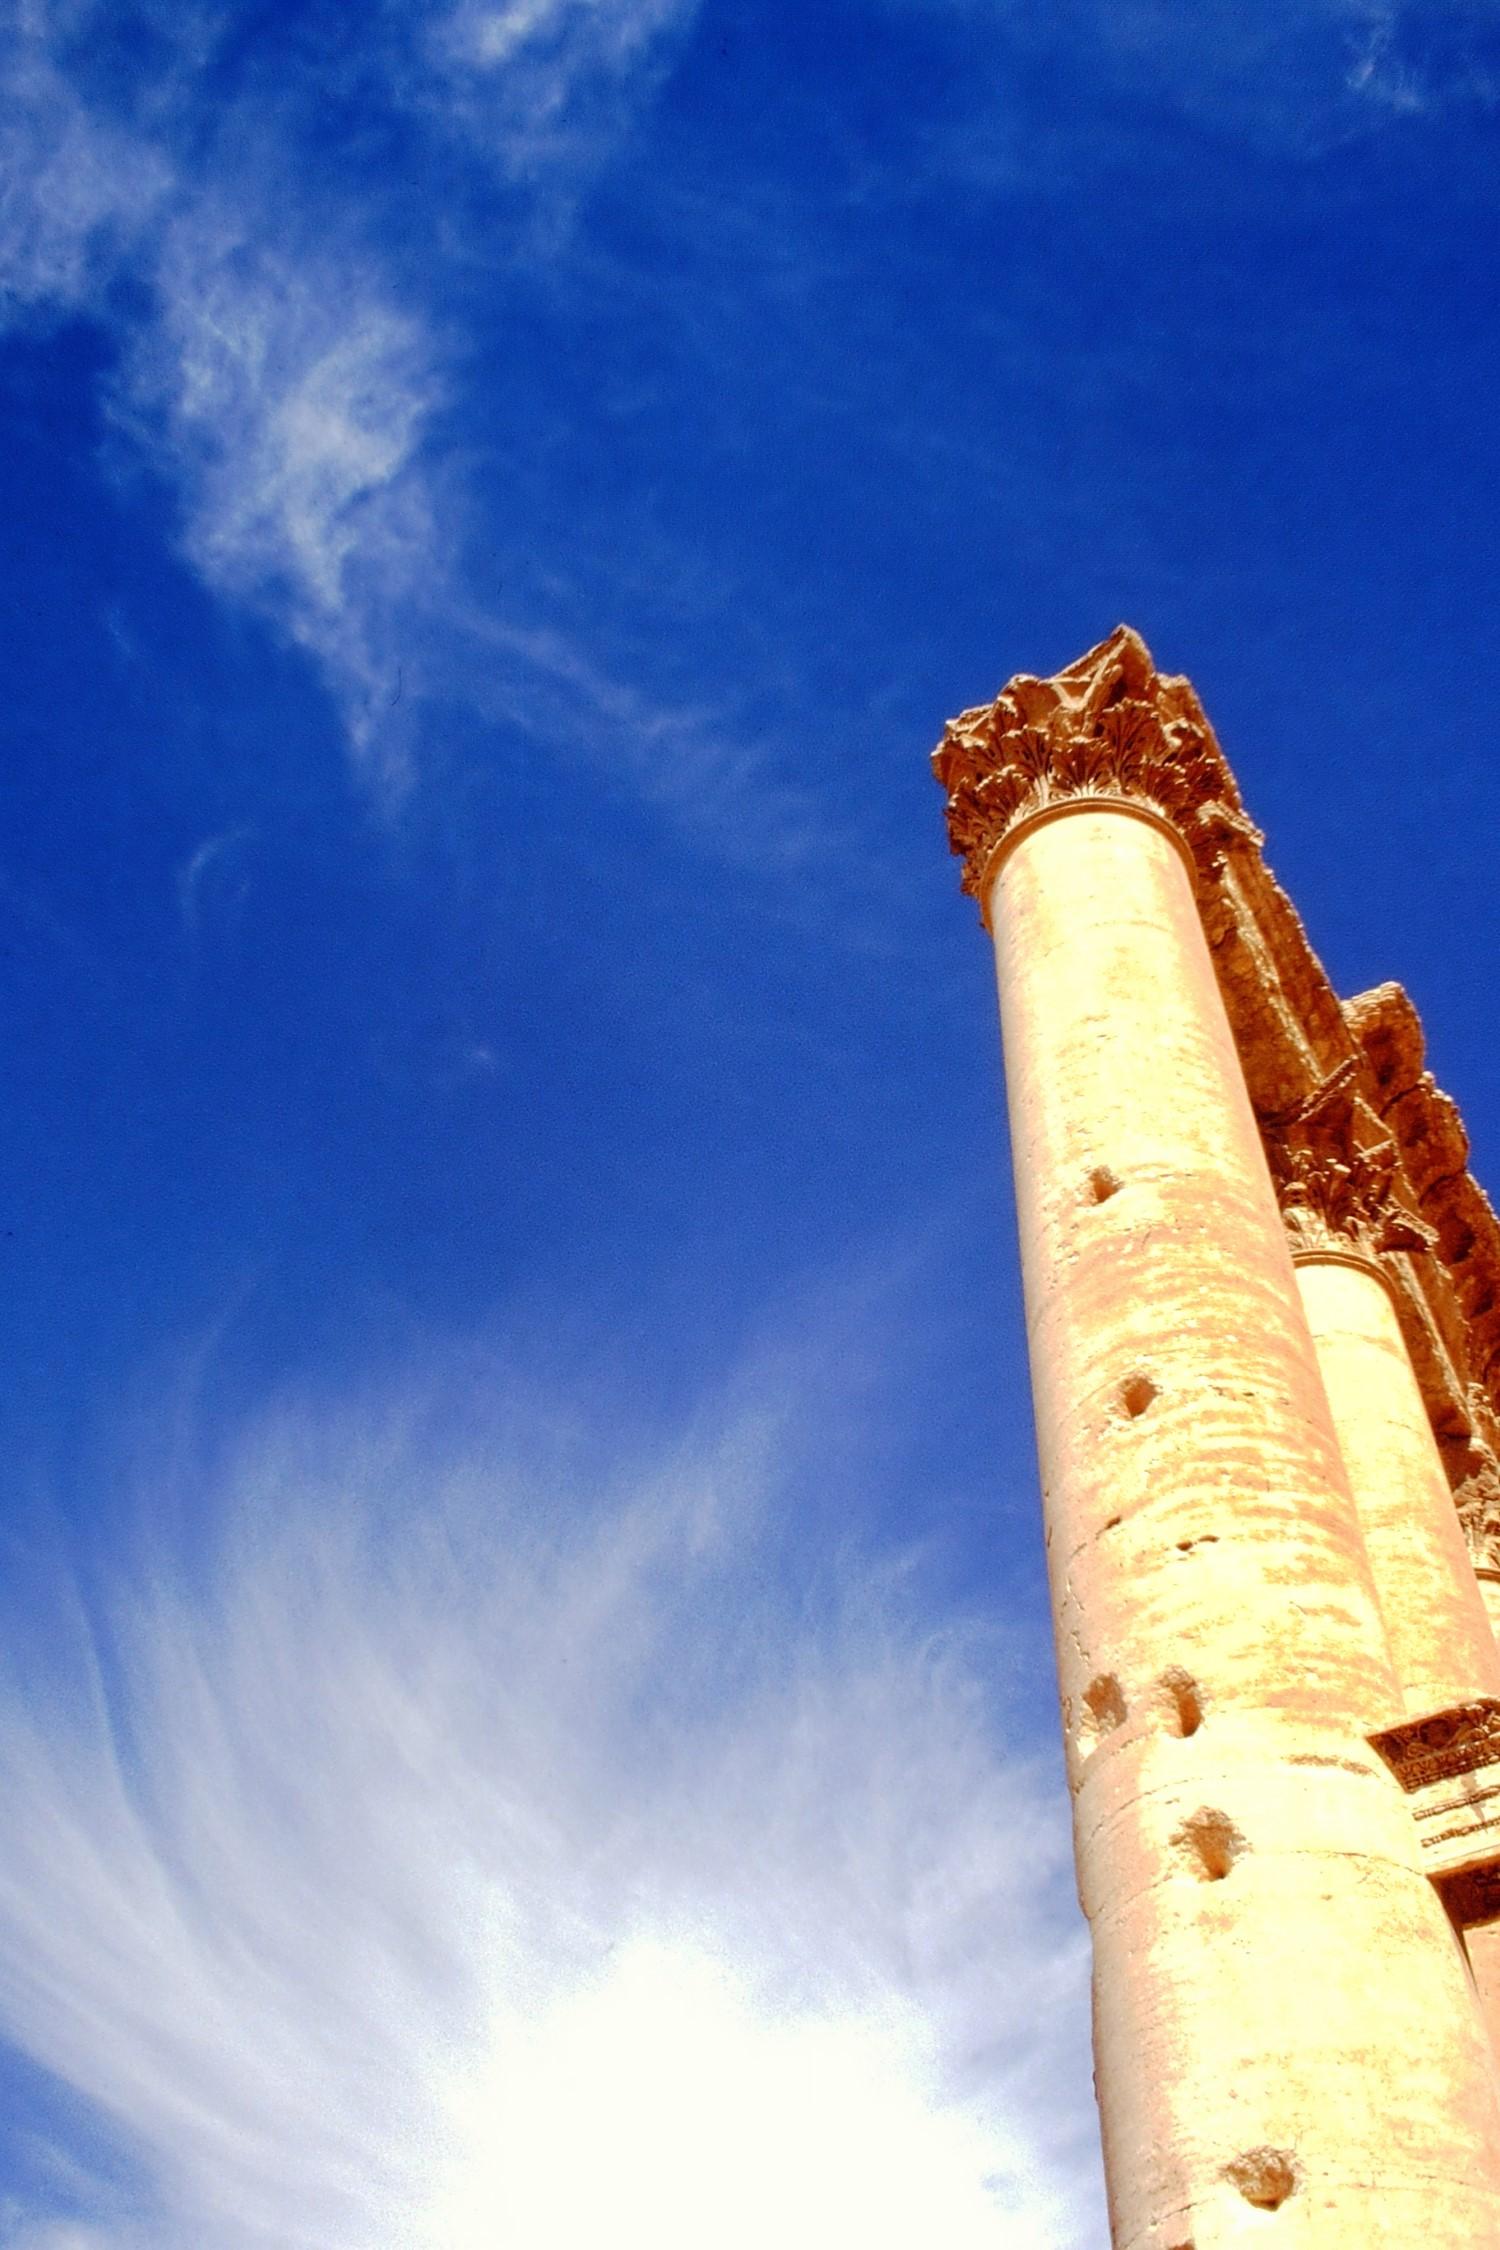 Columns against a blue sky